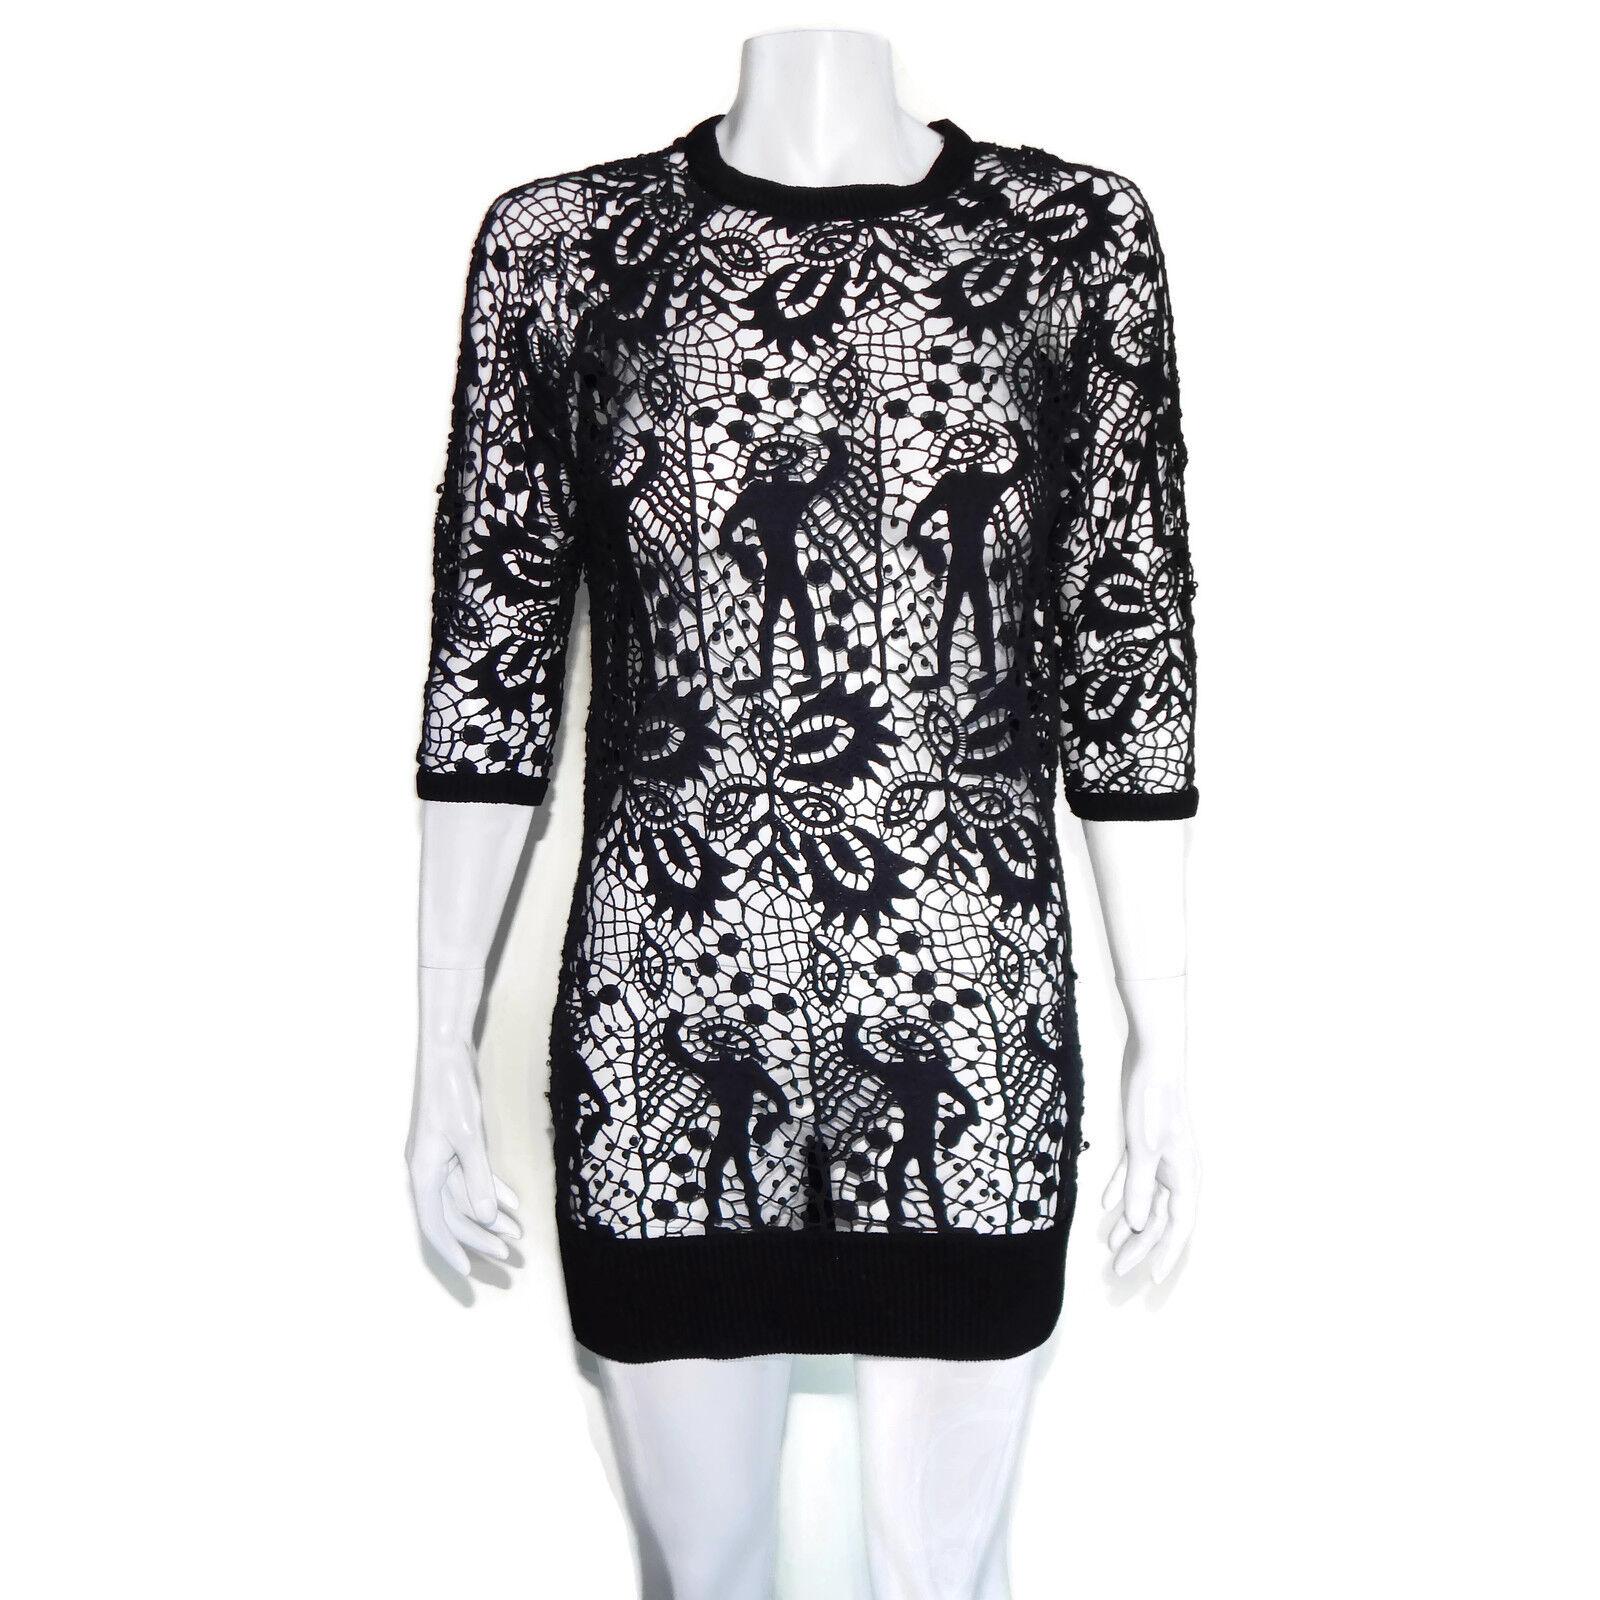 ISABEL MARANT schwarz Calico Lace Whimsical Detail Tunic Top Größe FR 40 US 8